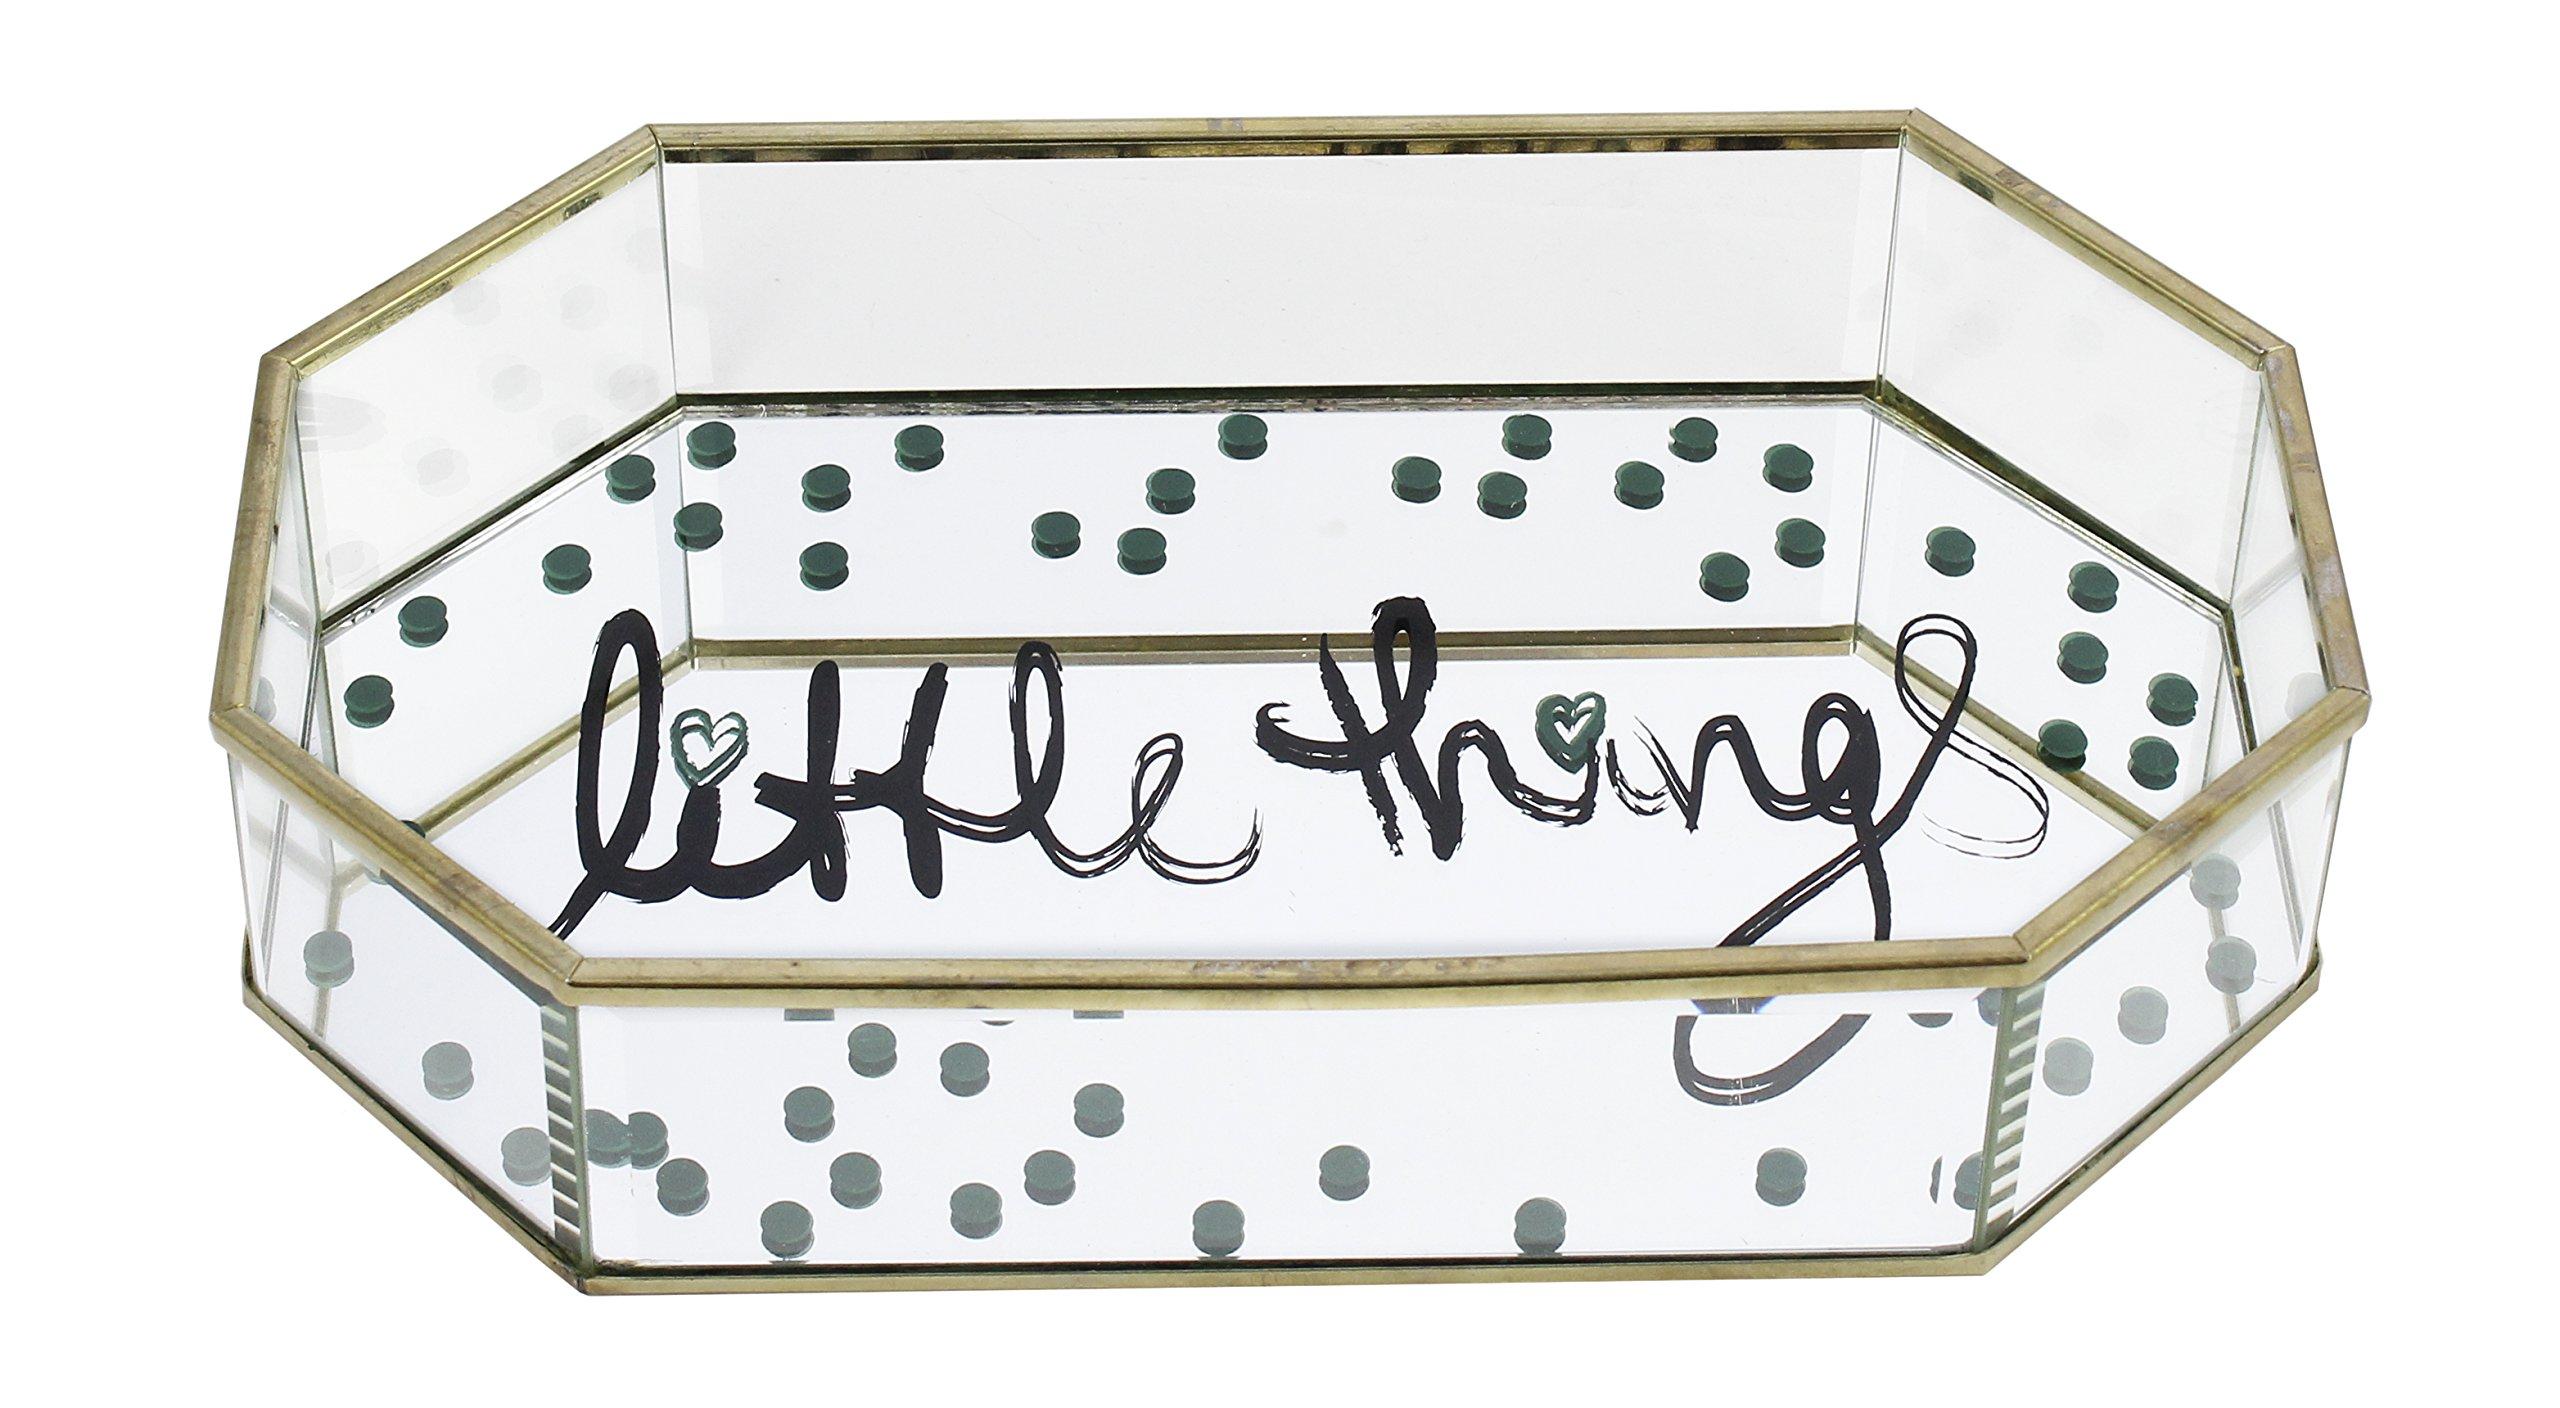 Kenton Grey Glass Jewelry Organizer – Tabletop Metal & Glass Jewelry Display Organizer Ring Tray to Organize Bracelets, Earrings, Rings & Watches, ''Little Things'', Octagon